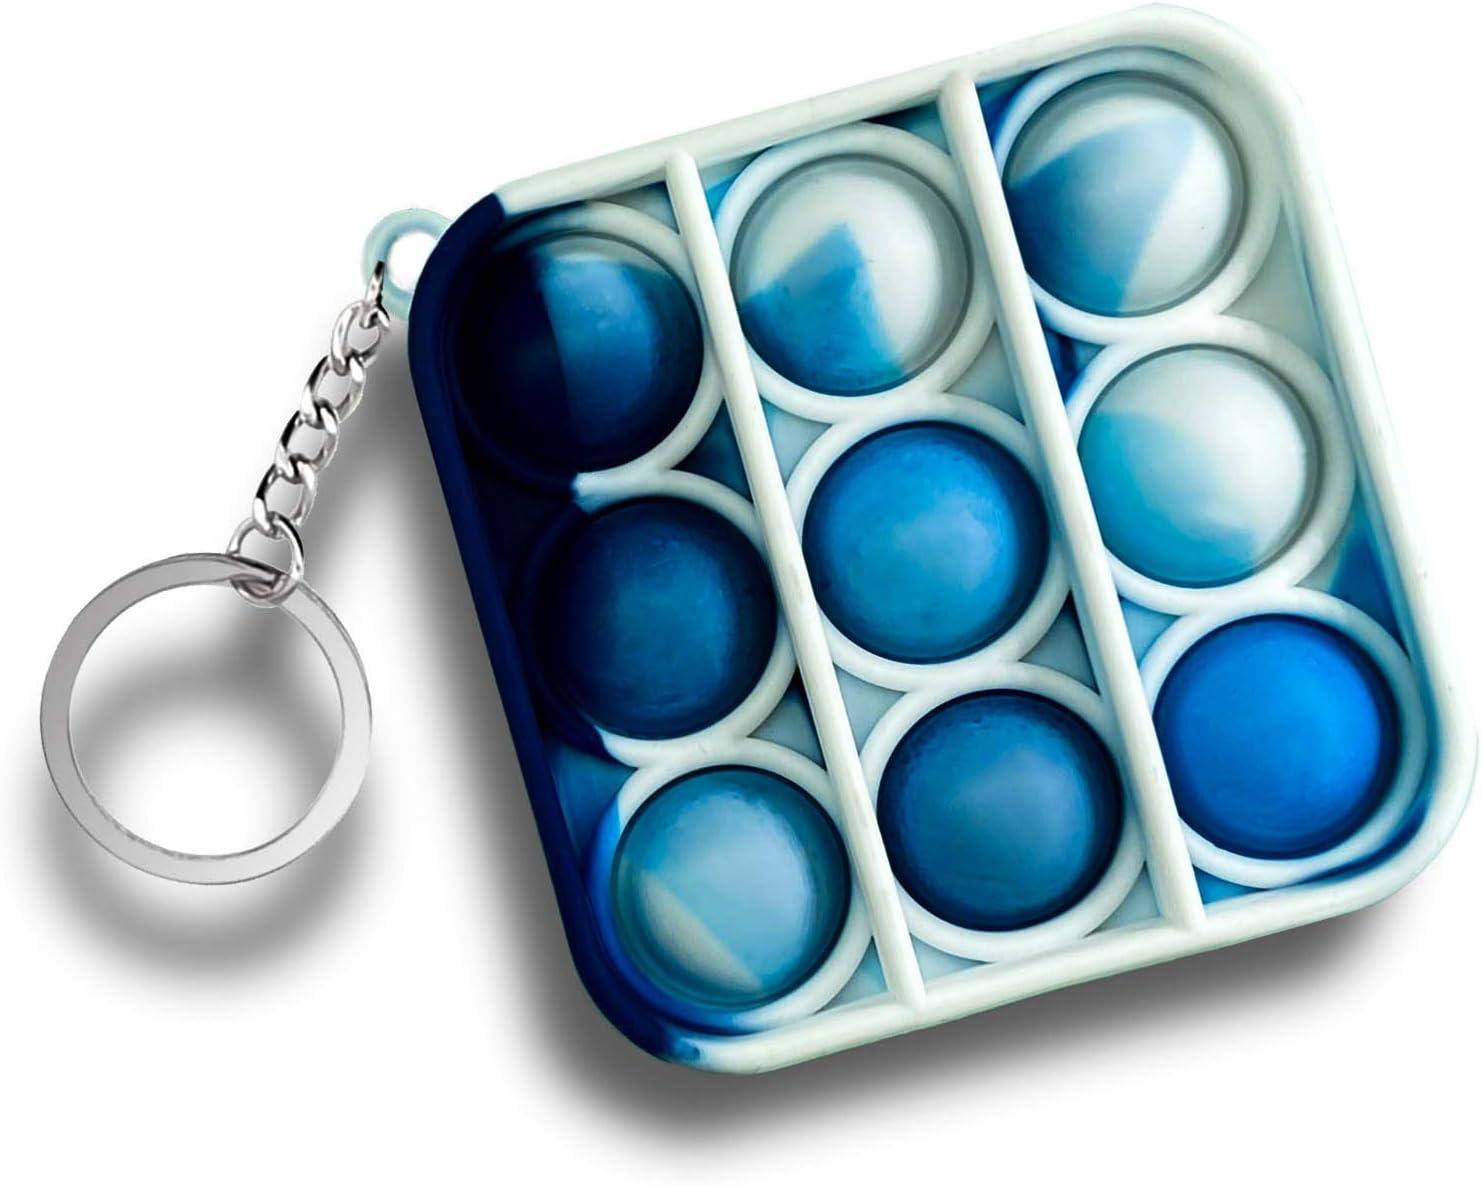 JANESVISSY Spring new work Mini Push pop Fidget Sensory Toys famous Bubble